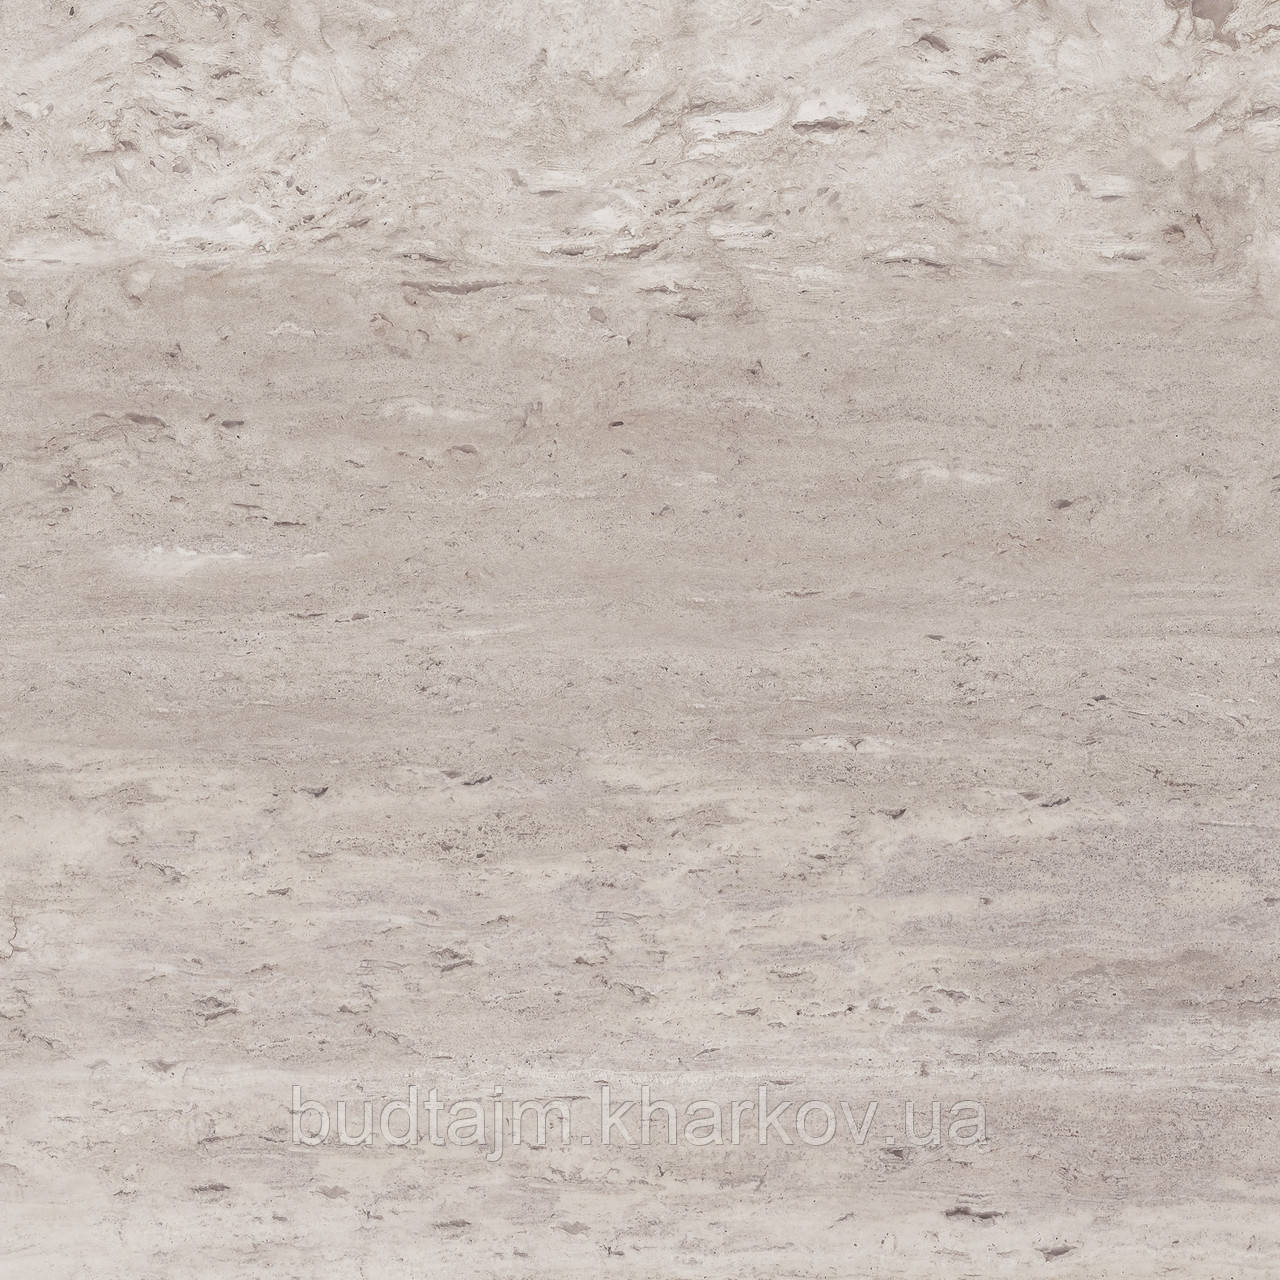 600х600 Керамогранит плитка пол Travertine Травертин светло-бежевый ректификат